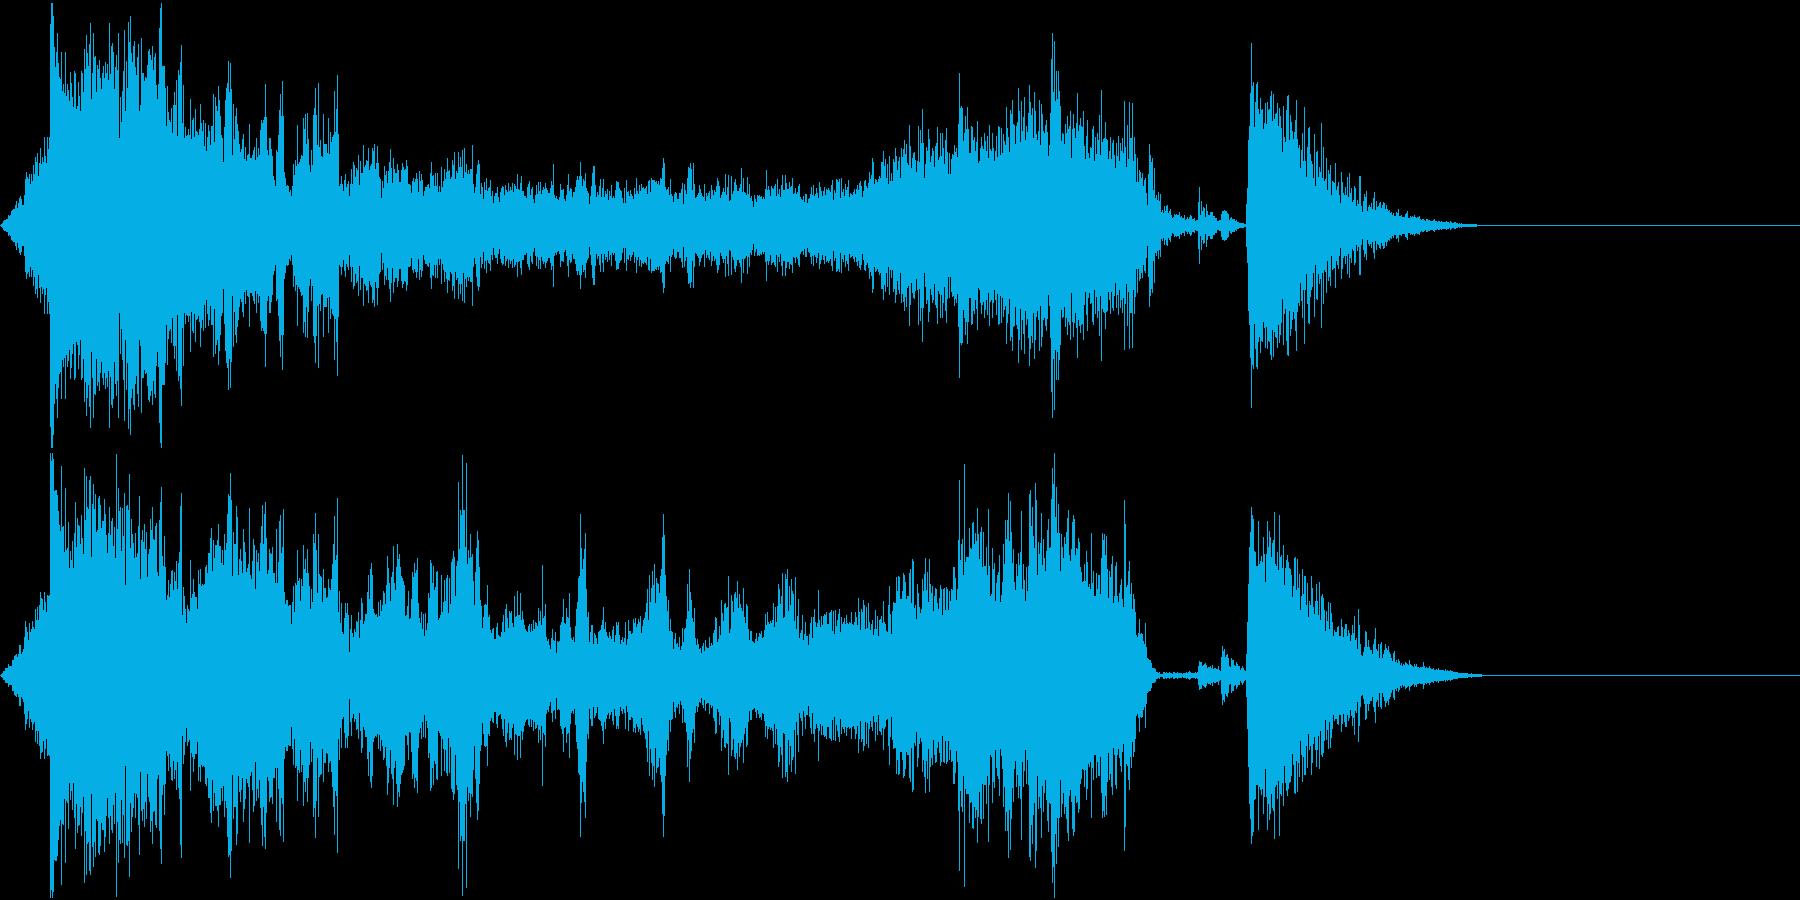 FMラジオ的ジングル6の再生済みの波形